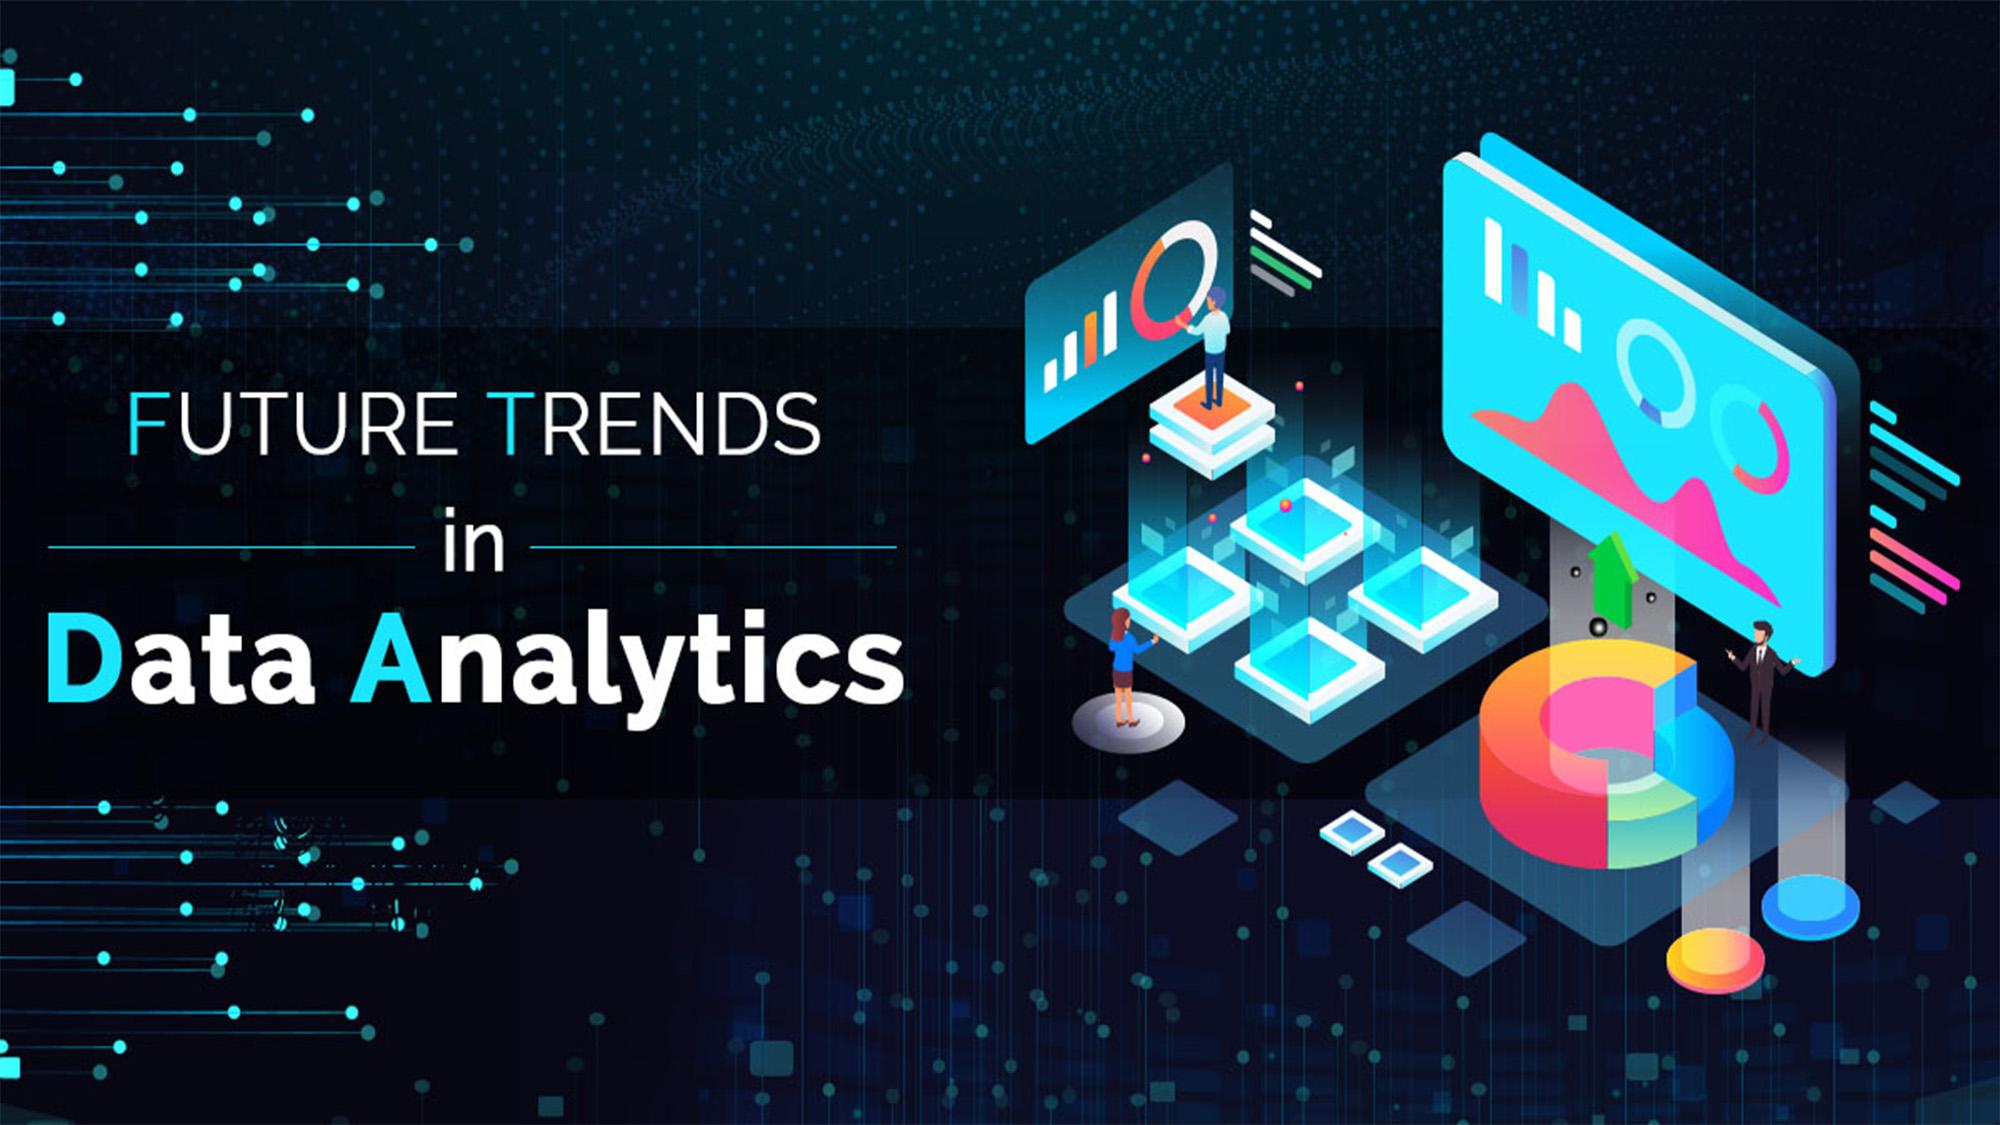 Future Trends in Data Analytics